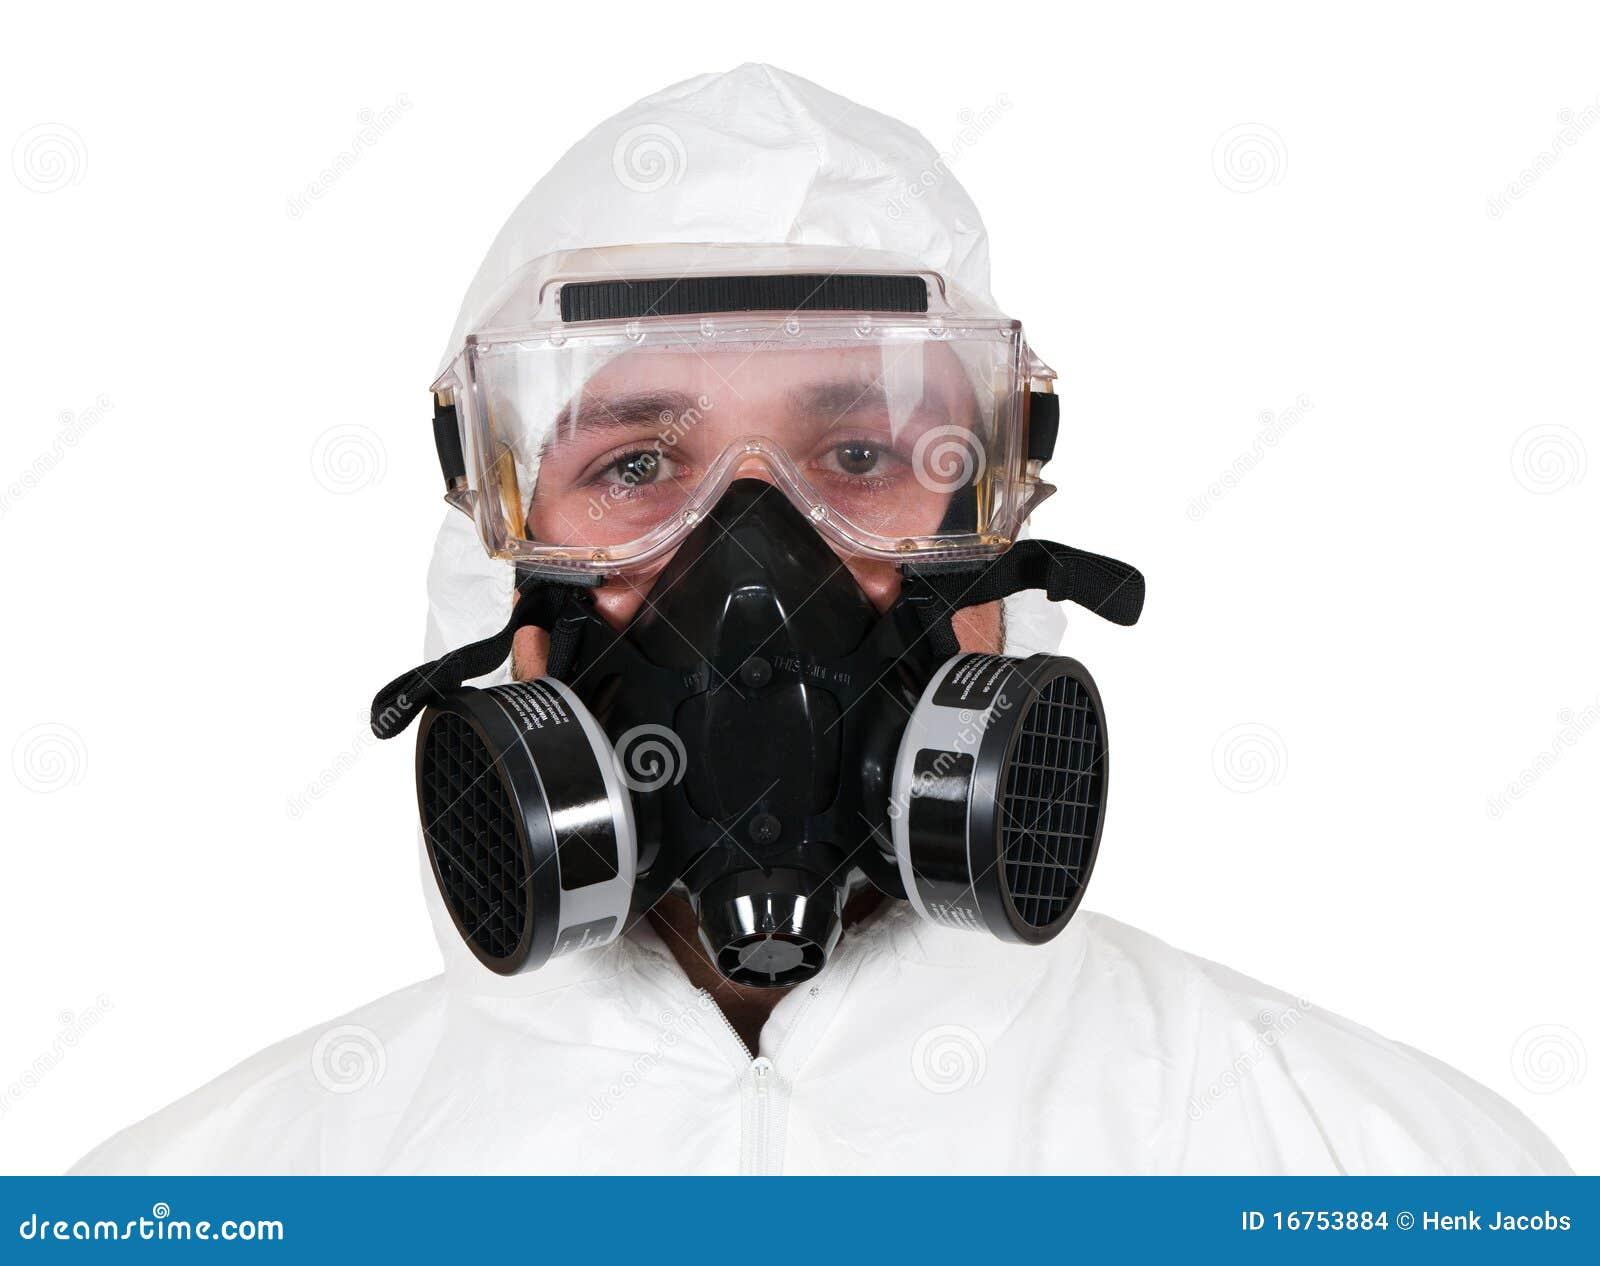 Closeup of Bio-Hazard Man